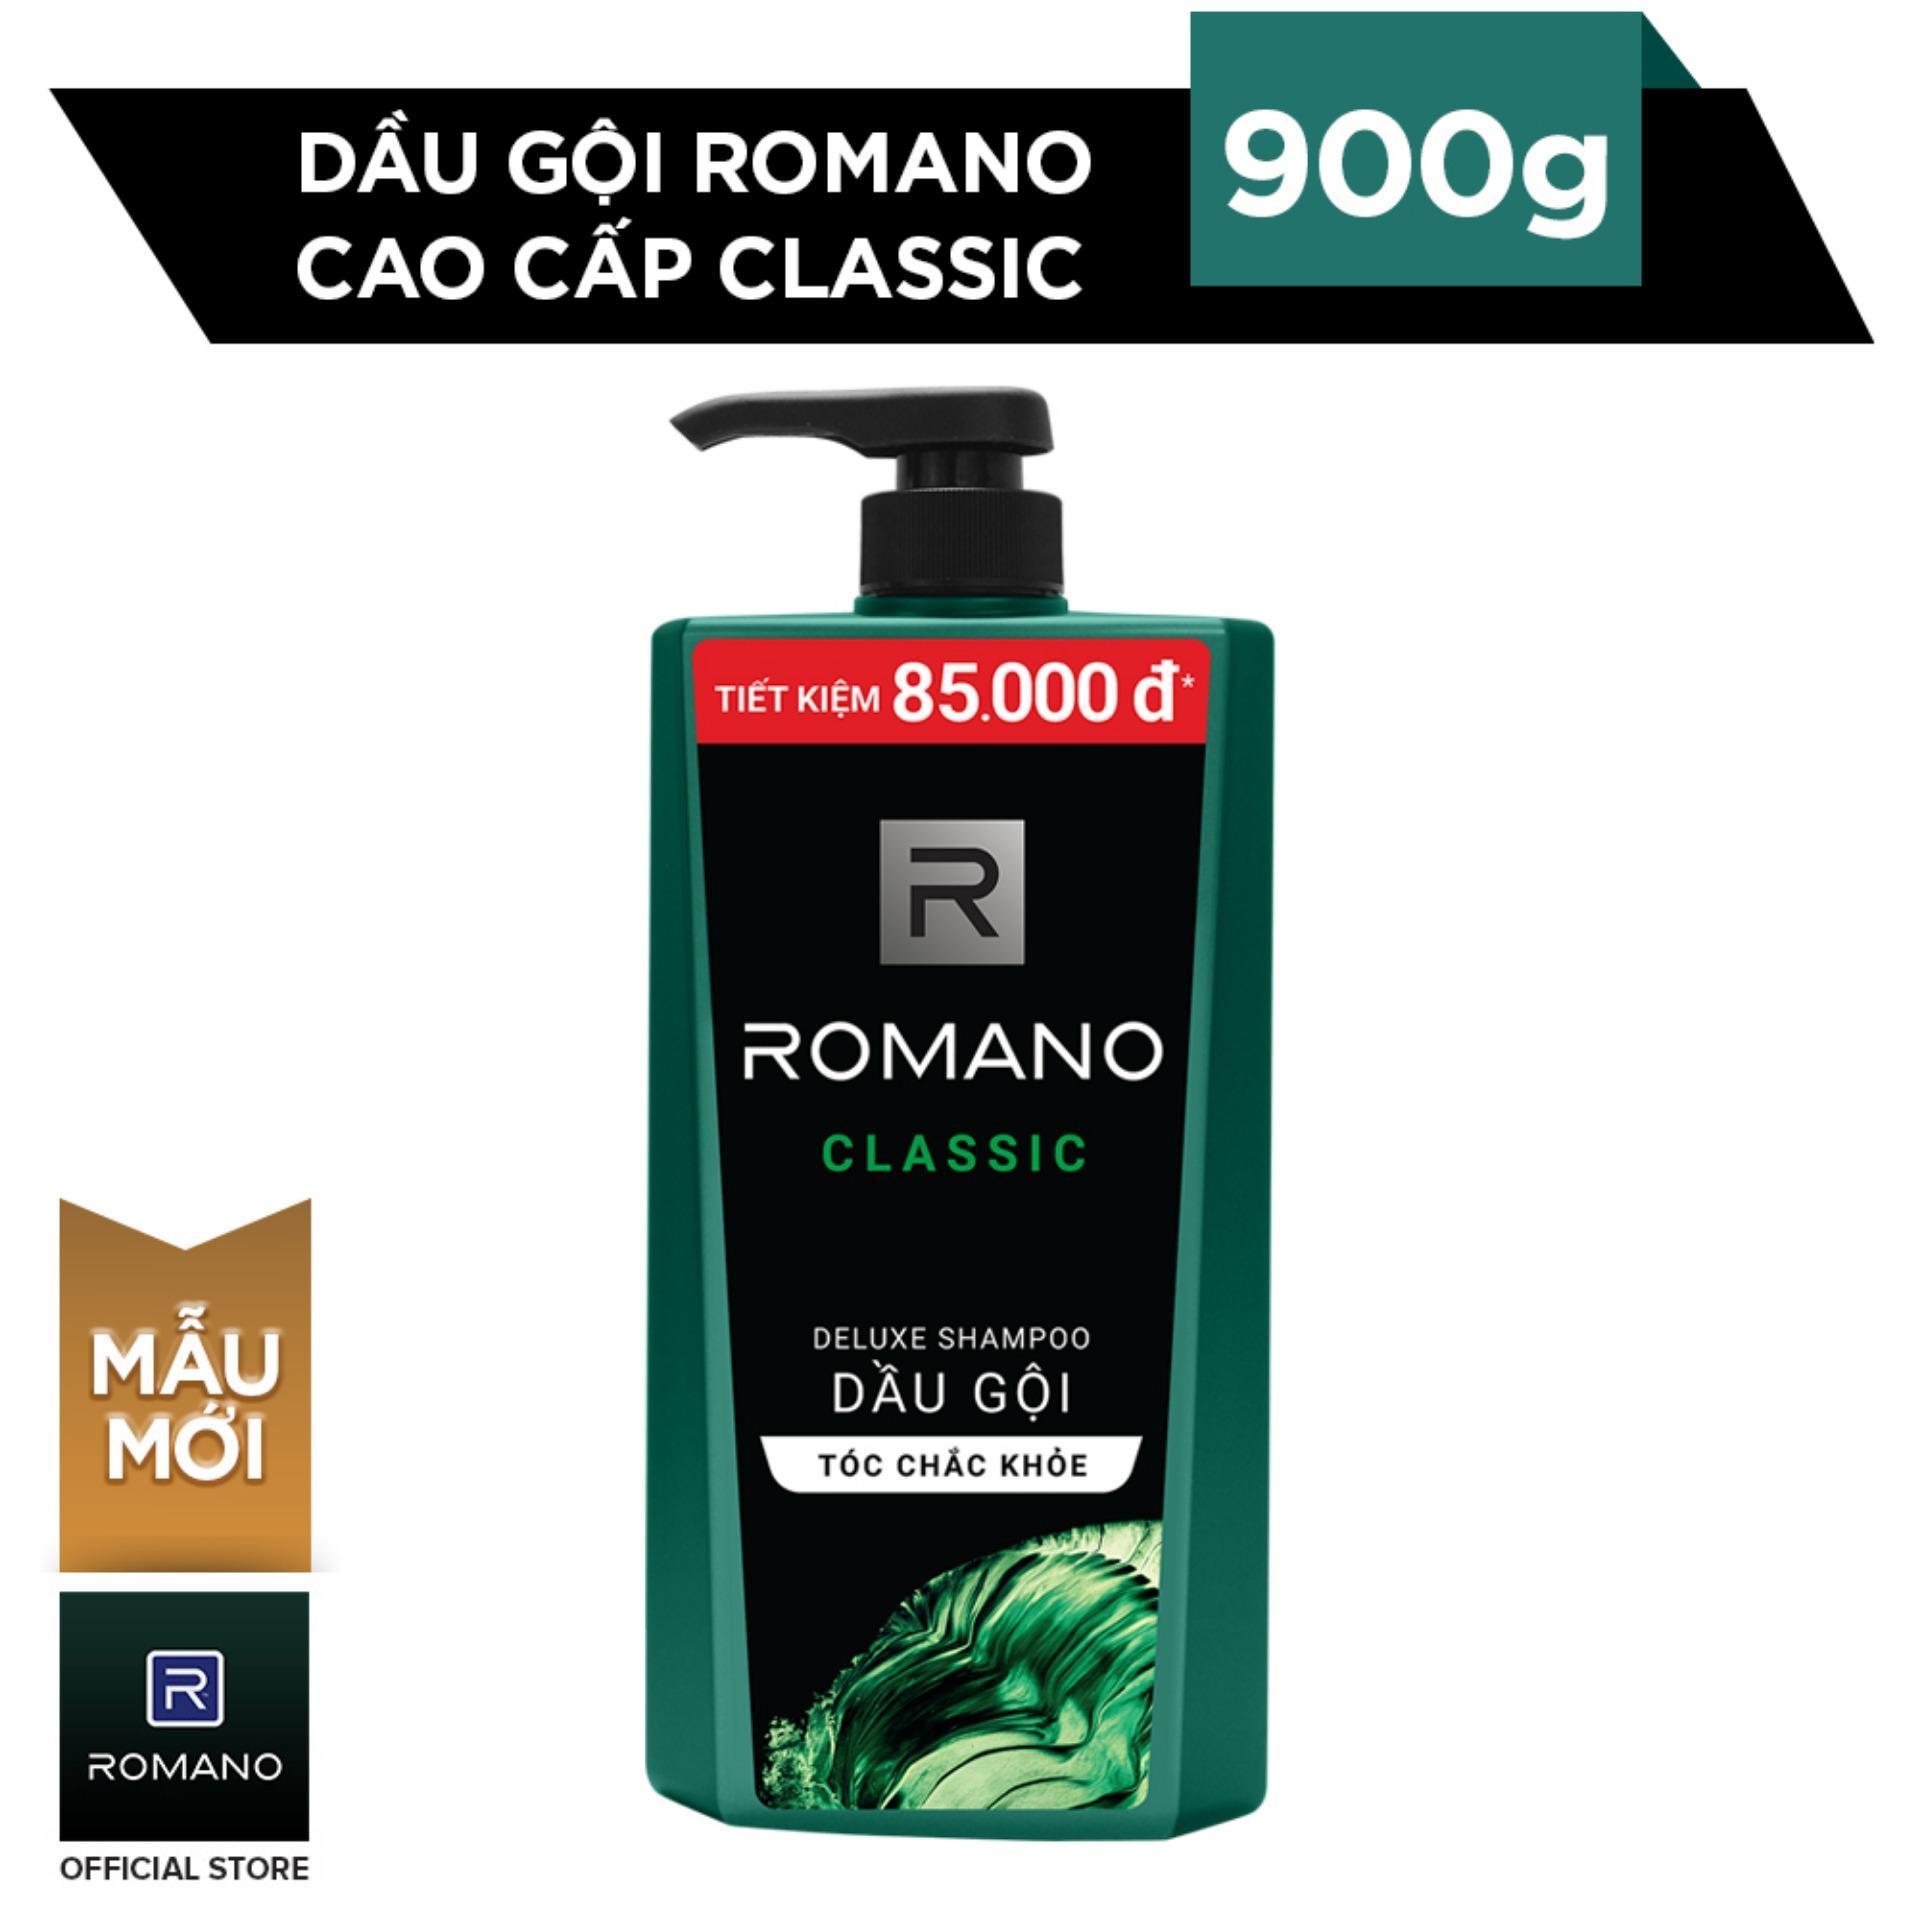 Dầu gội Romano Classic 900g